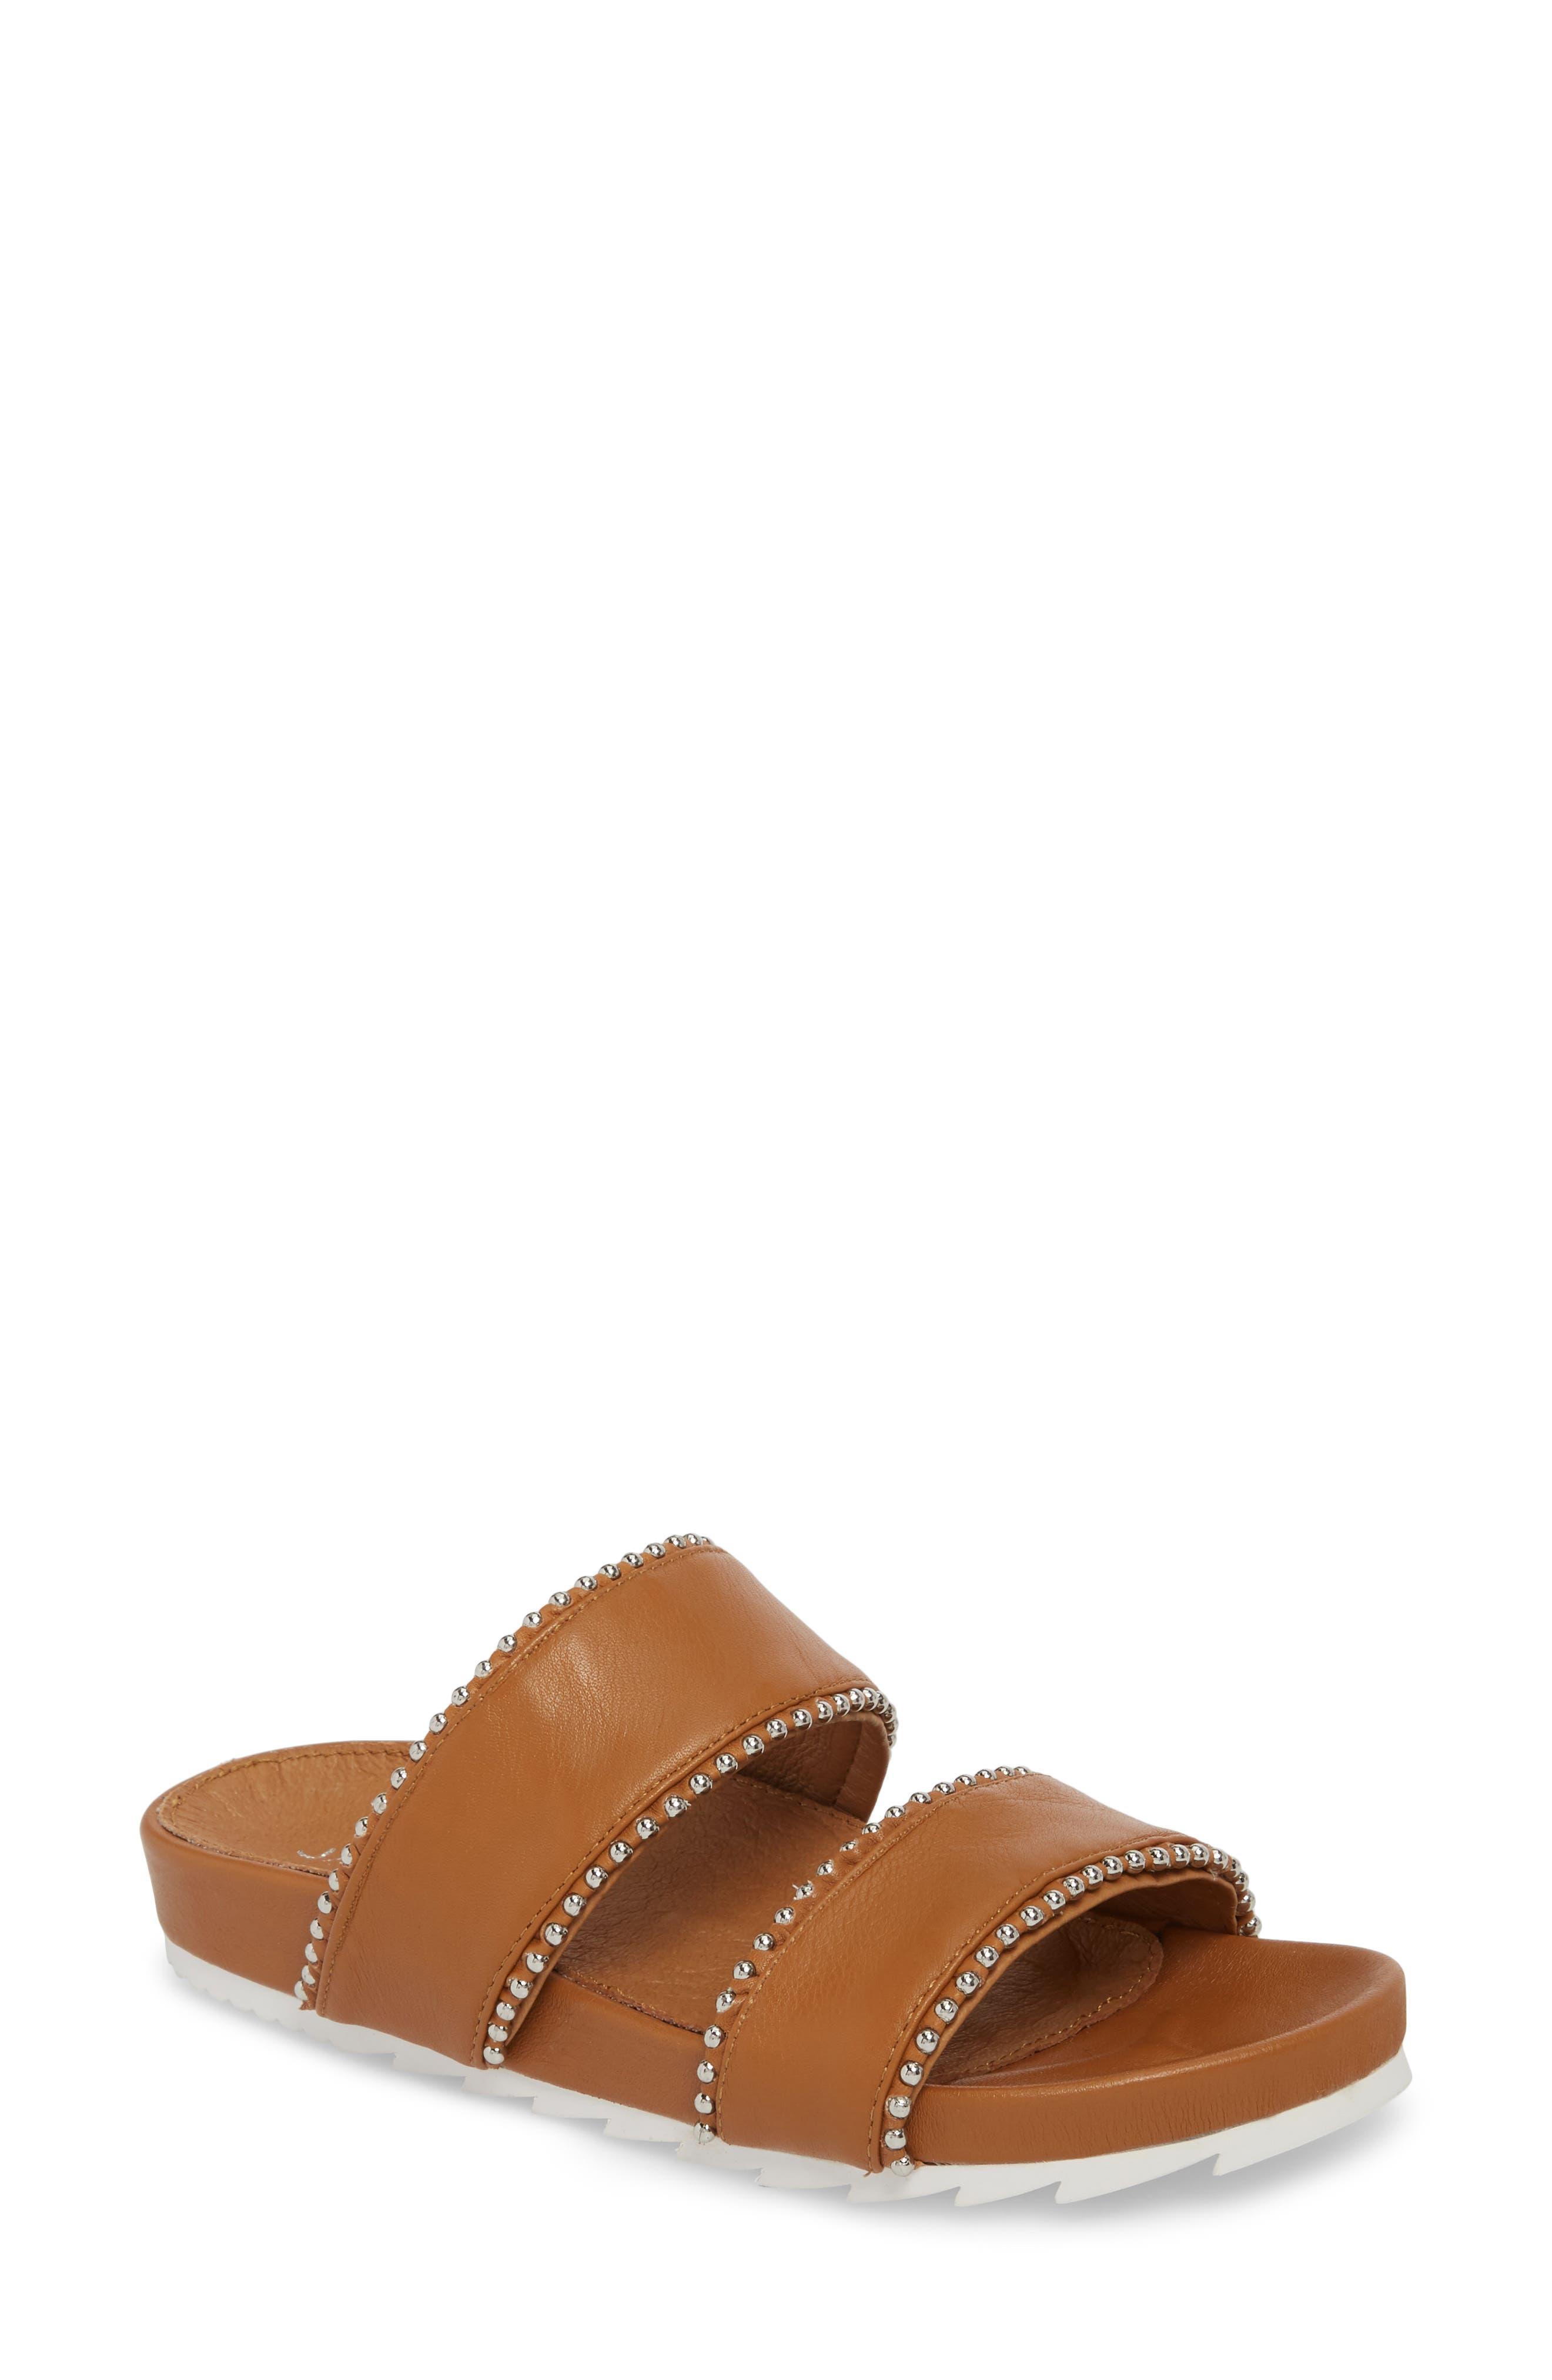 JSlides Emmie Bead Chain Slide Sandal (Women)